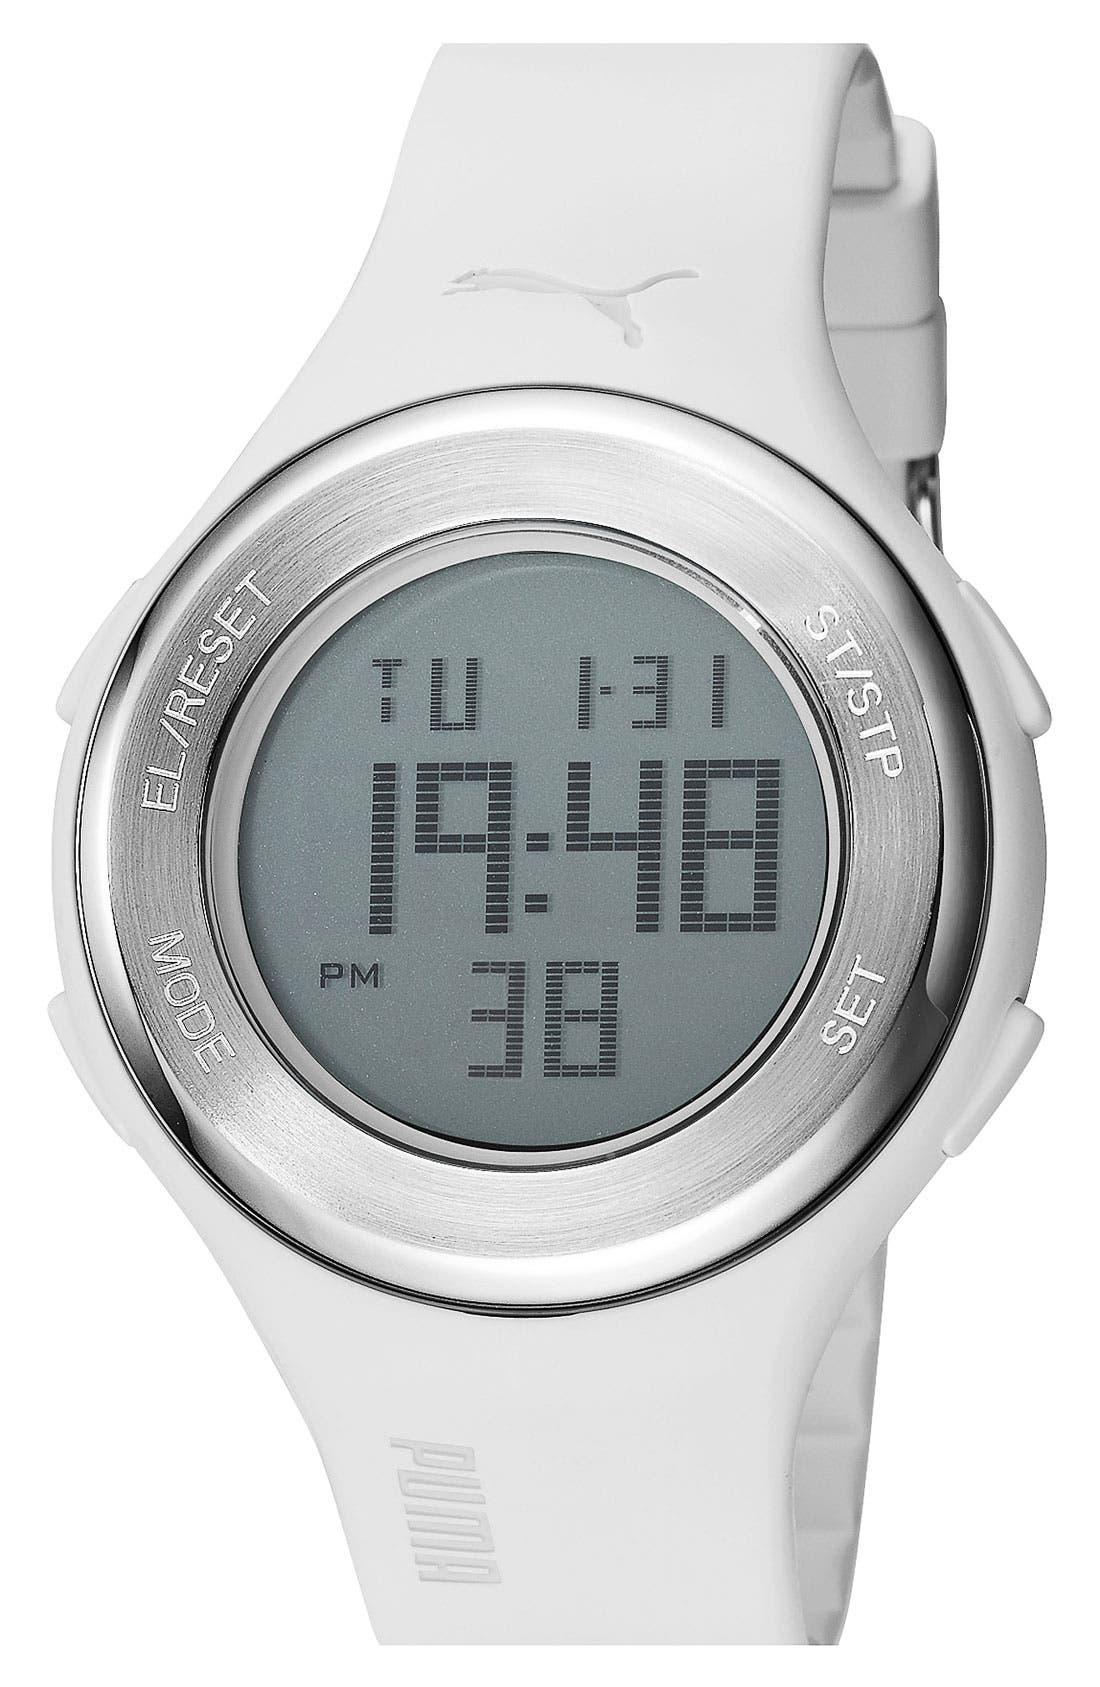 Alternate Image 1 Selected - PUMA 'Loop' Digital Chronograph Watch, 44mm